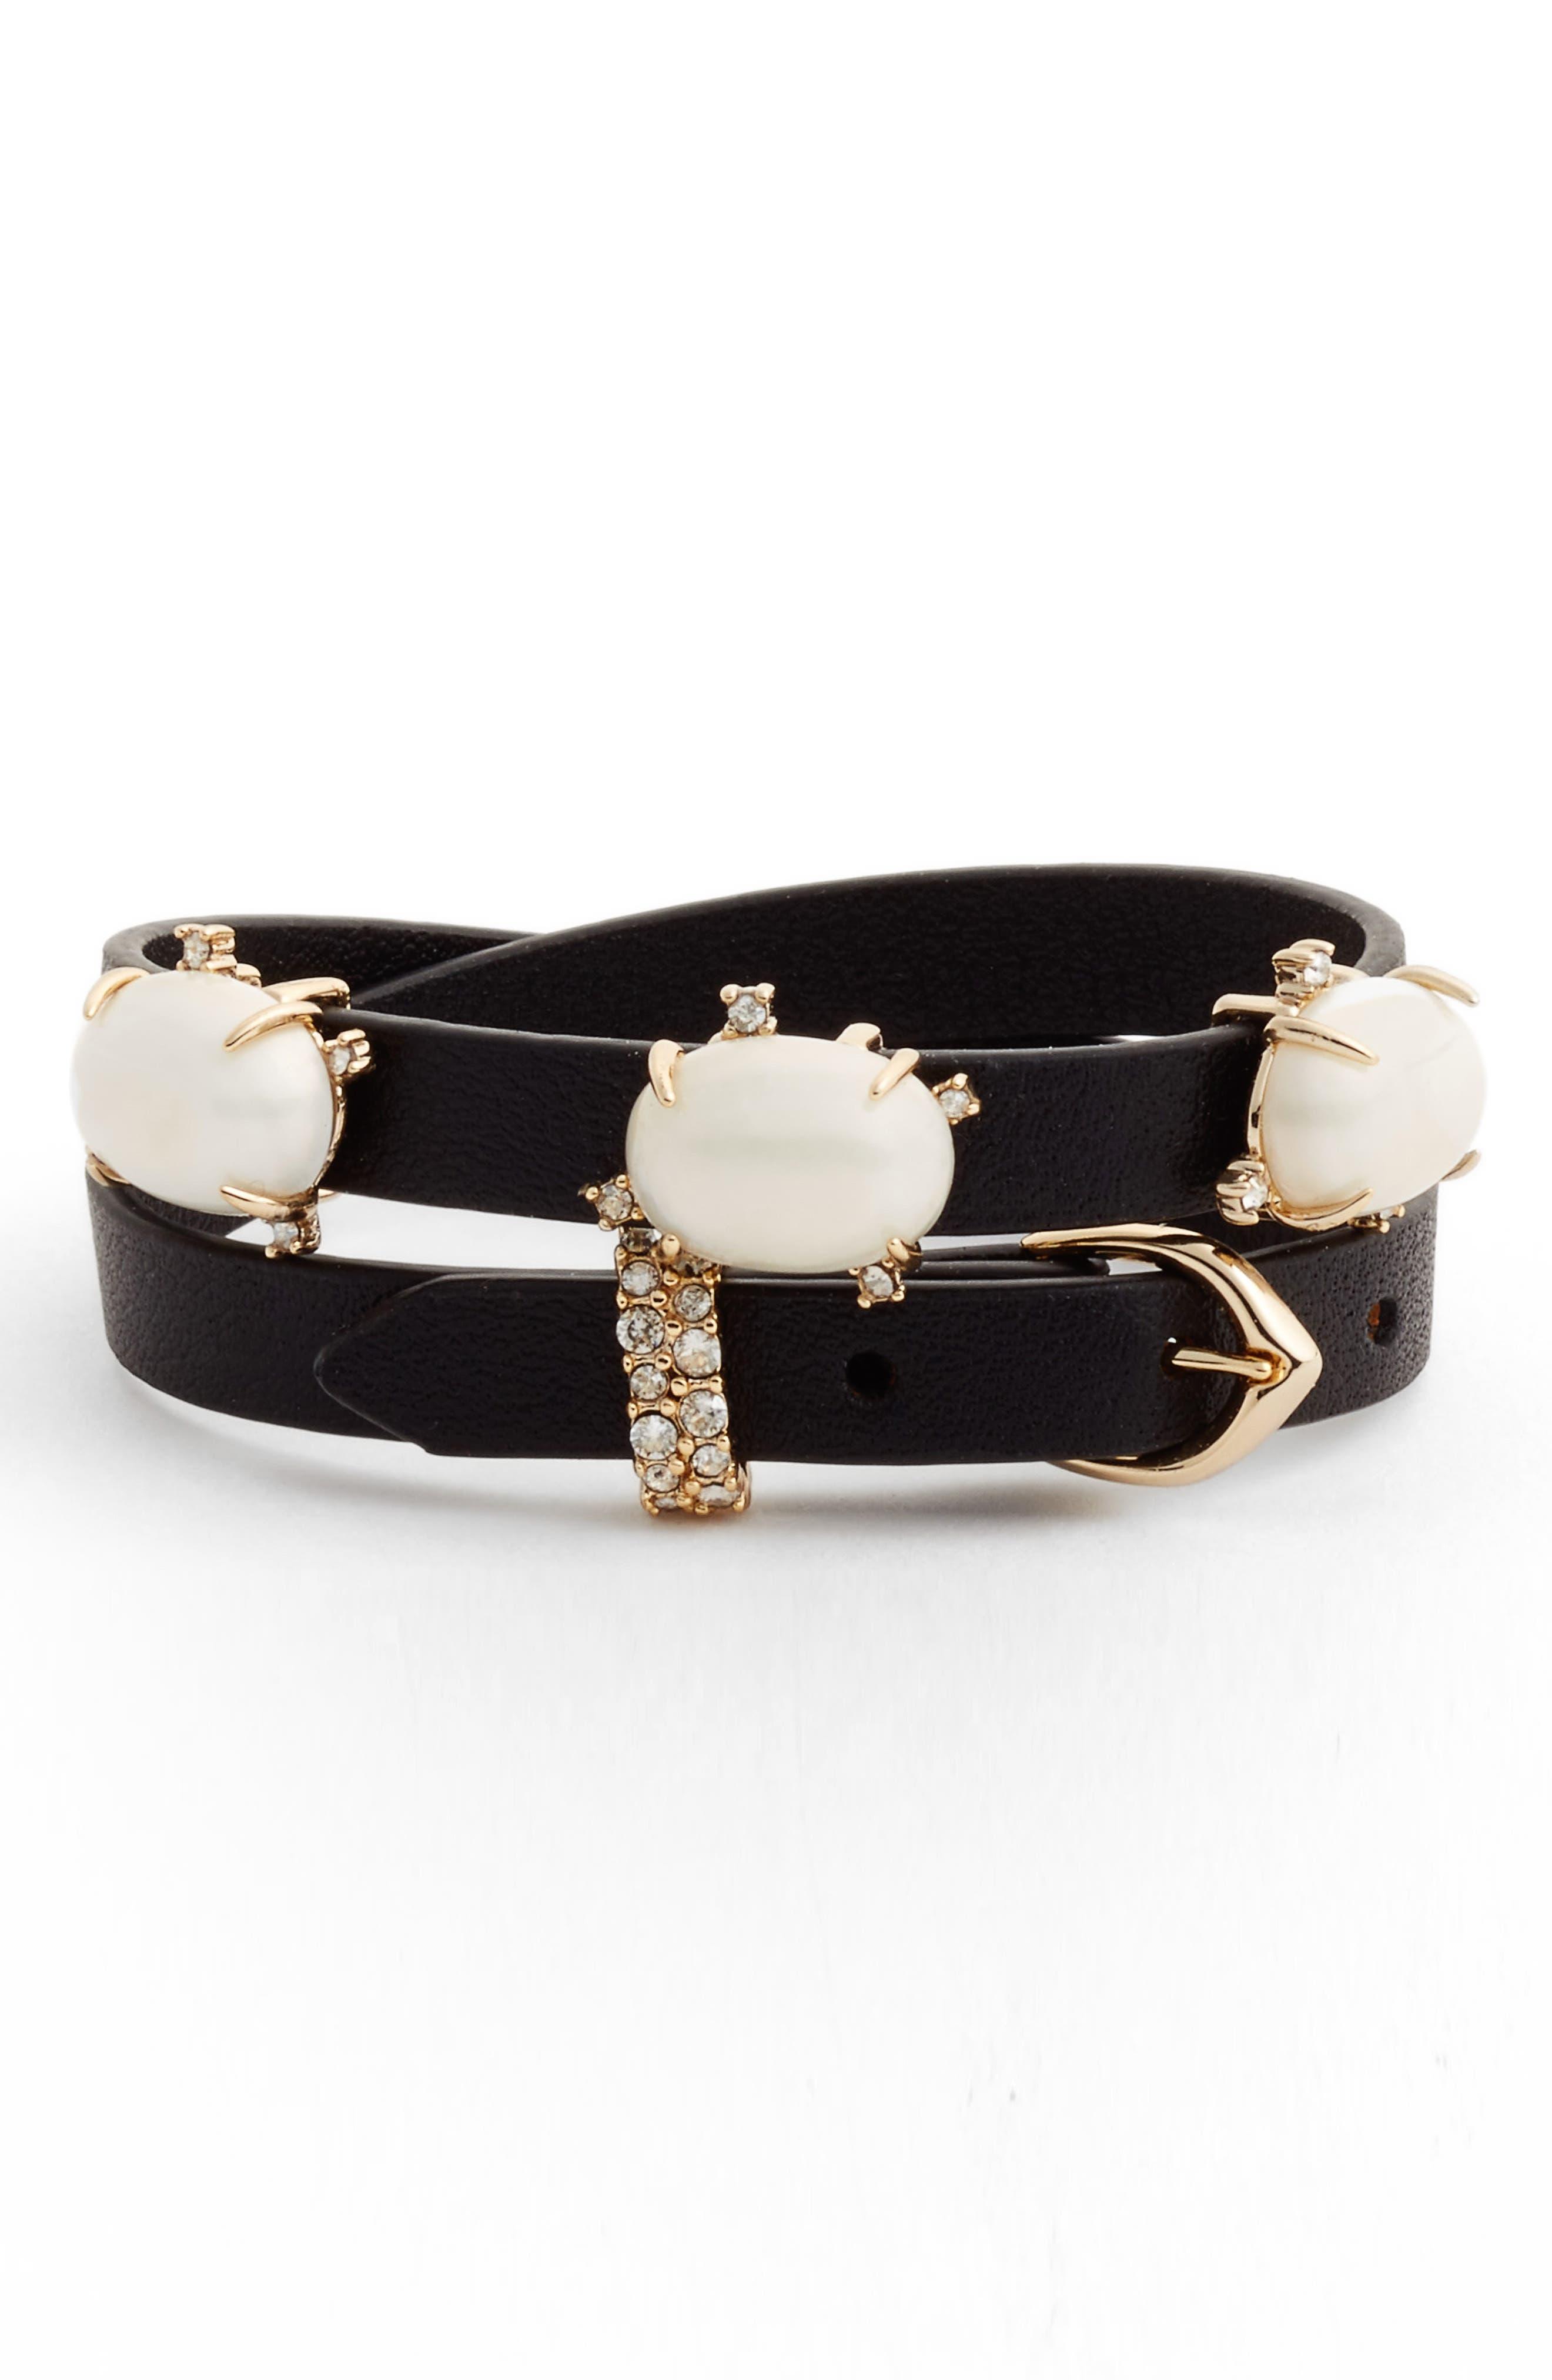 ALEXIS BITTAR Stone Leather Wrap Bracelet & Choker